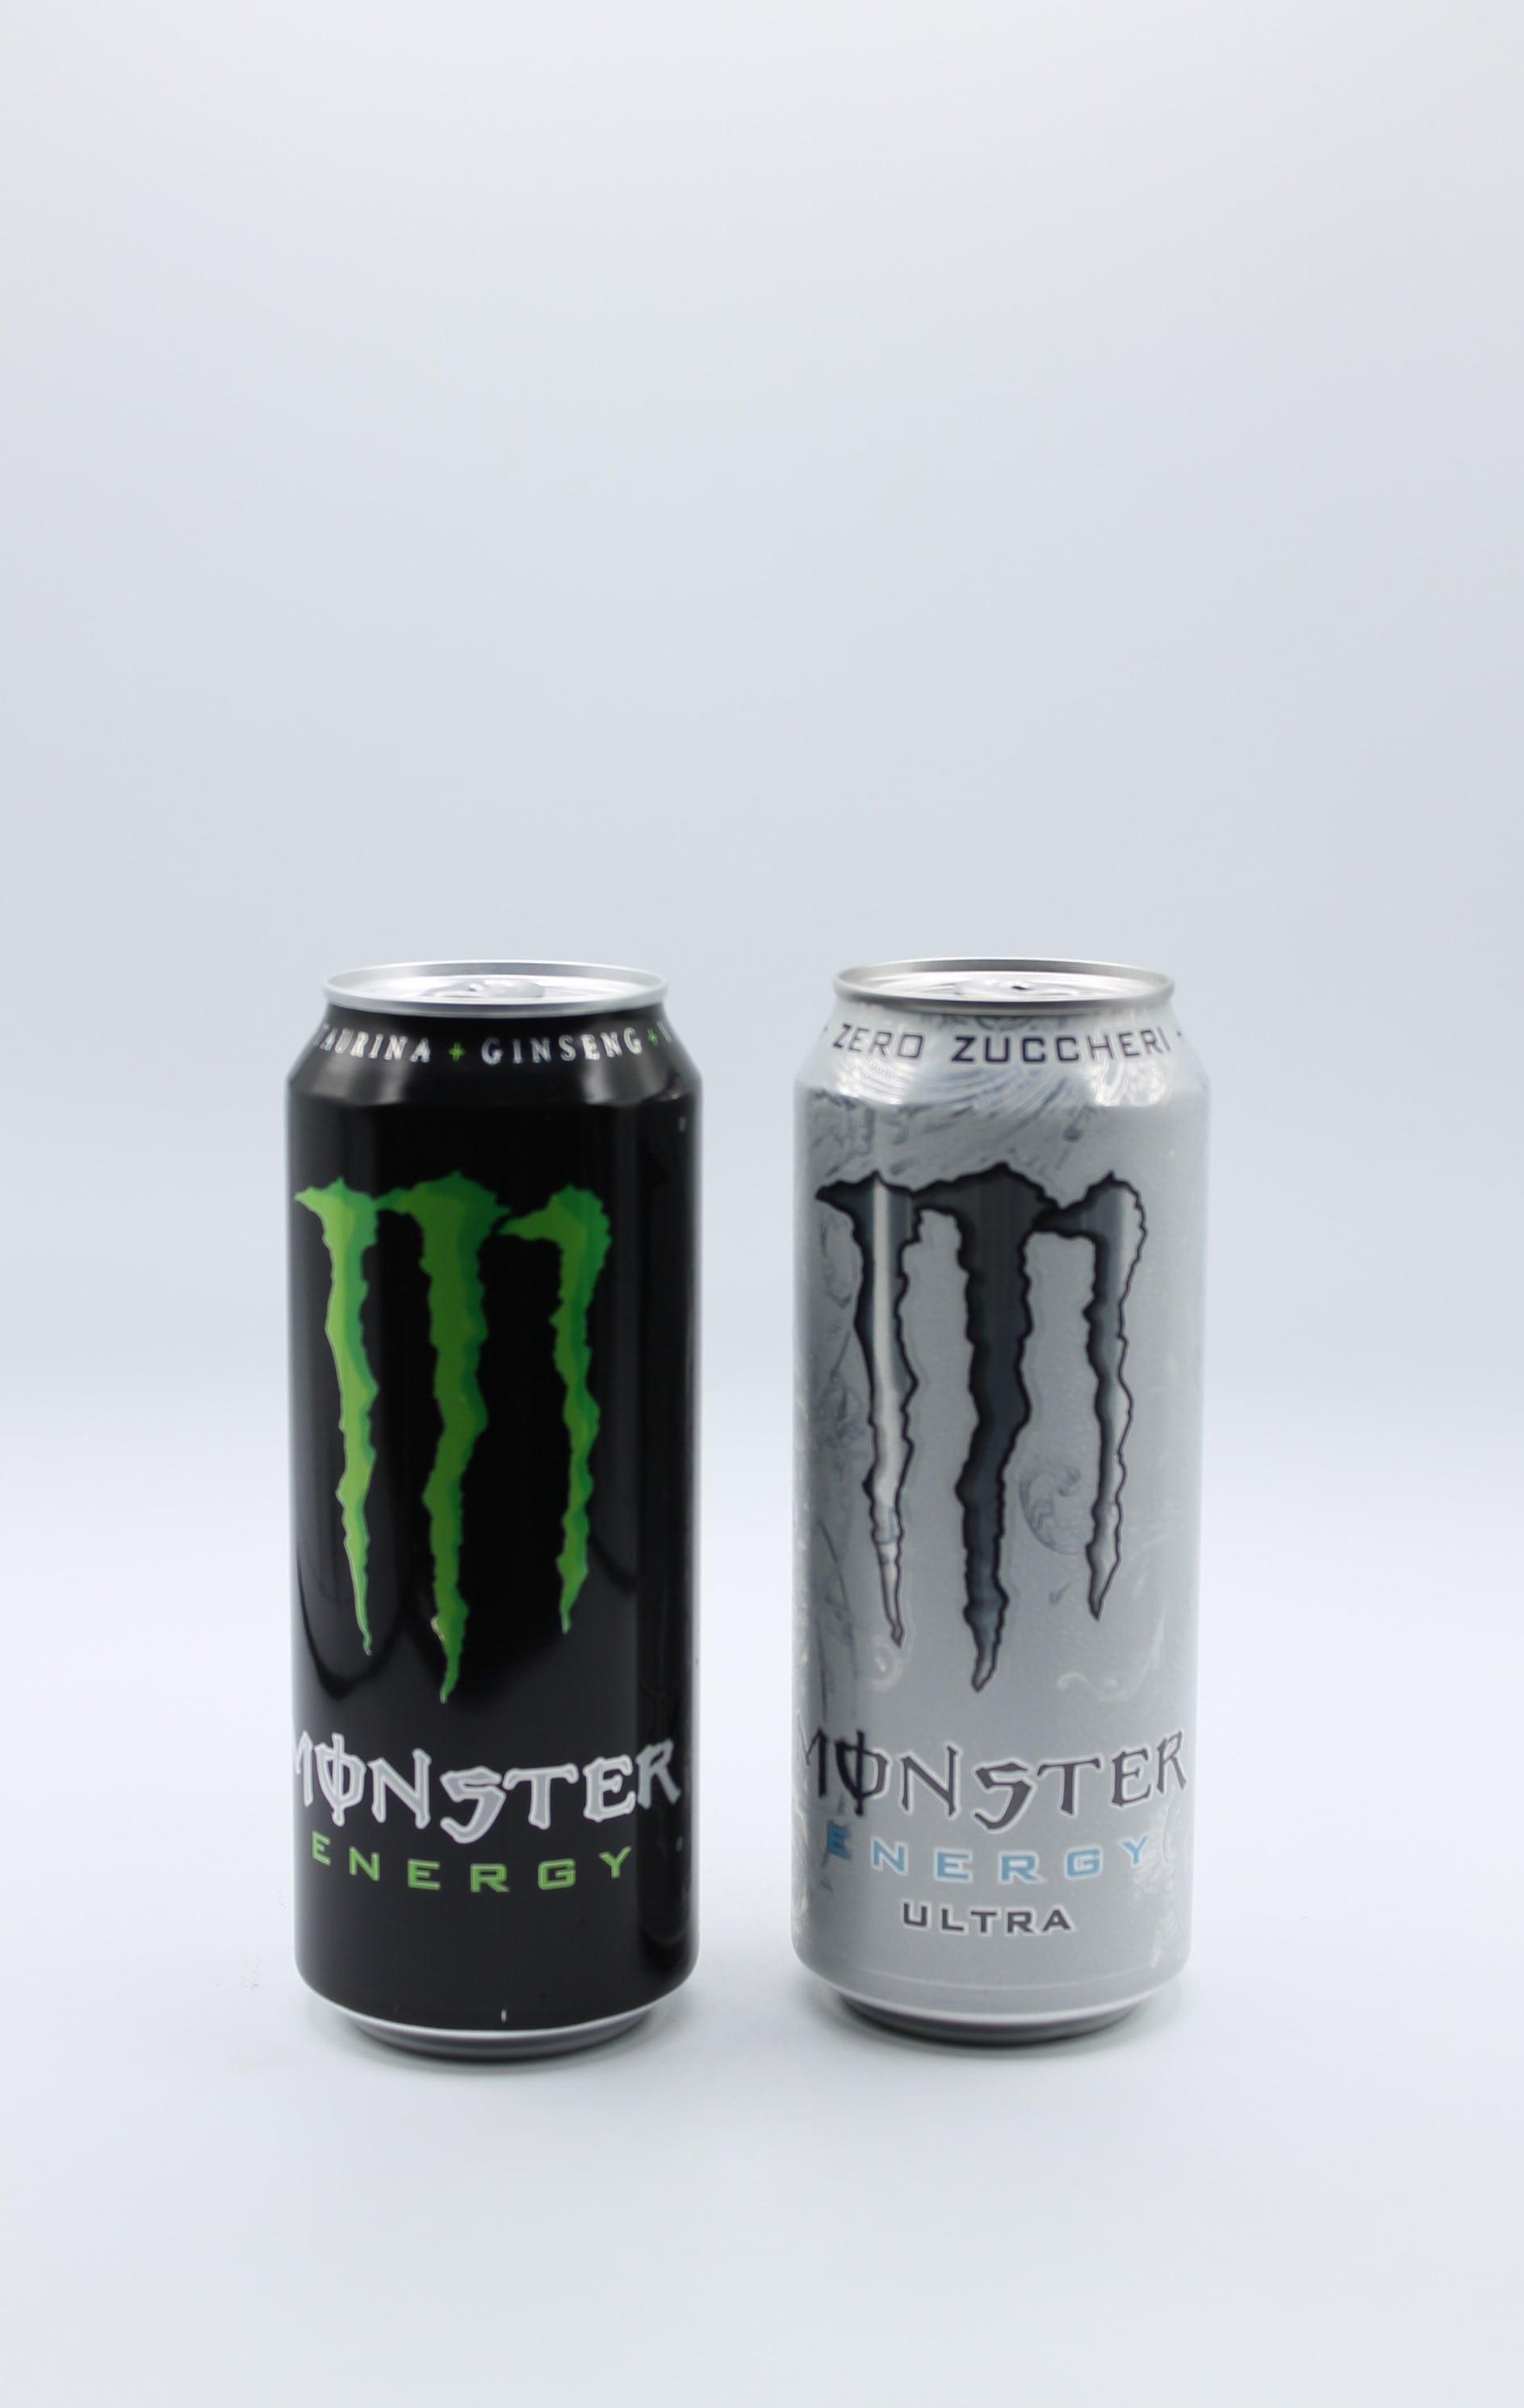 Monster energy drink lattina 500ml vari gusti.